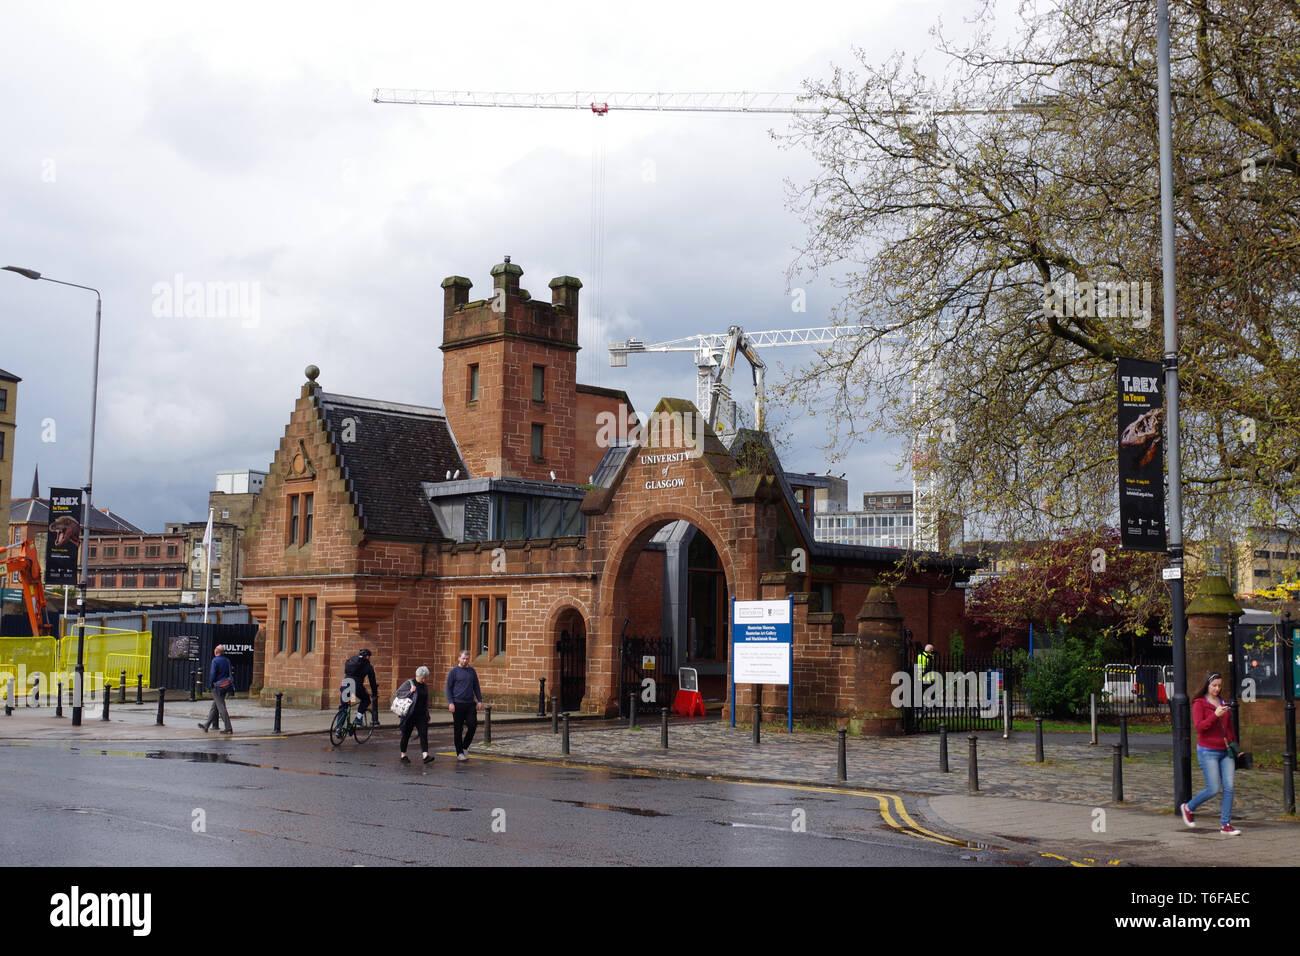 Entrance to Glasgow University on Dumbarton Road, Partick, Glasgow, Scotland - Stock Image